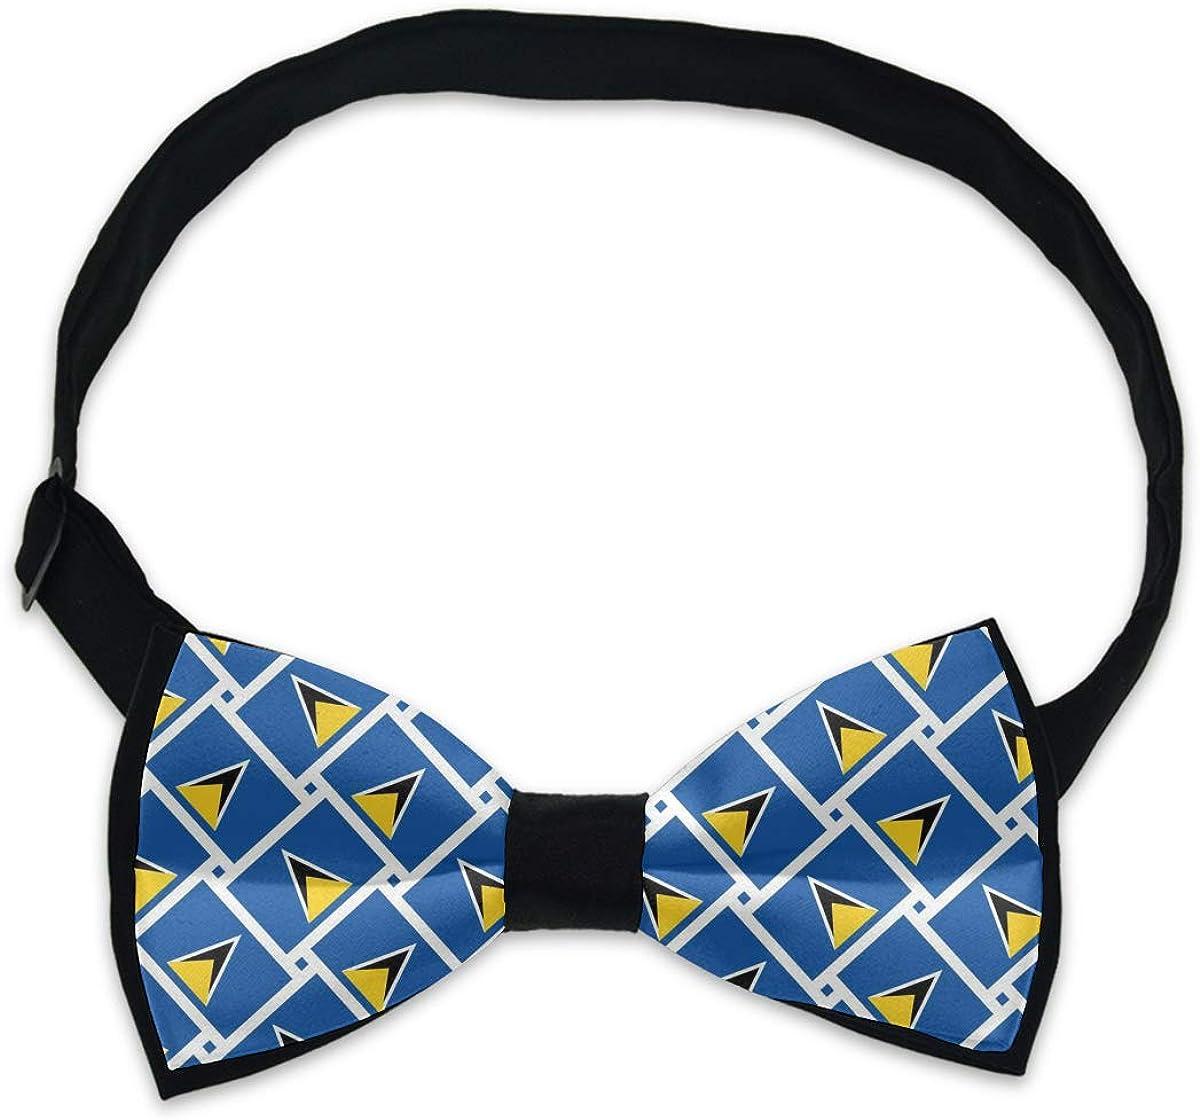 Men's Formal Suit Tuxedo Bow Tie, Casual Novelty Cravat for Party Business